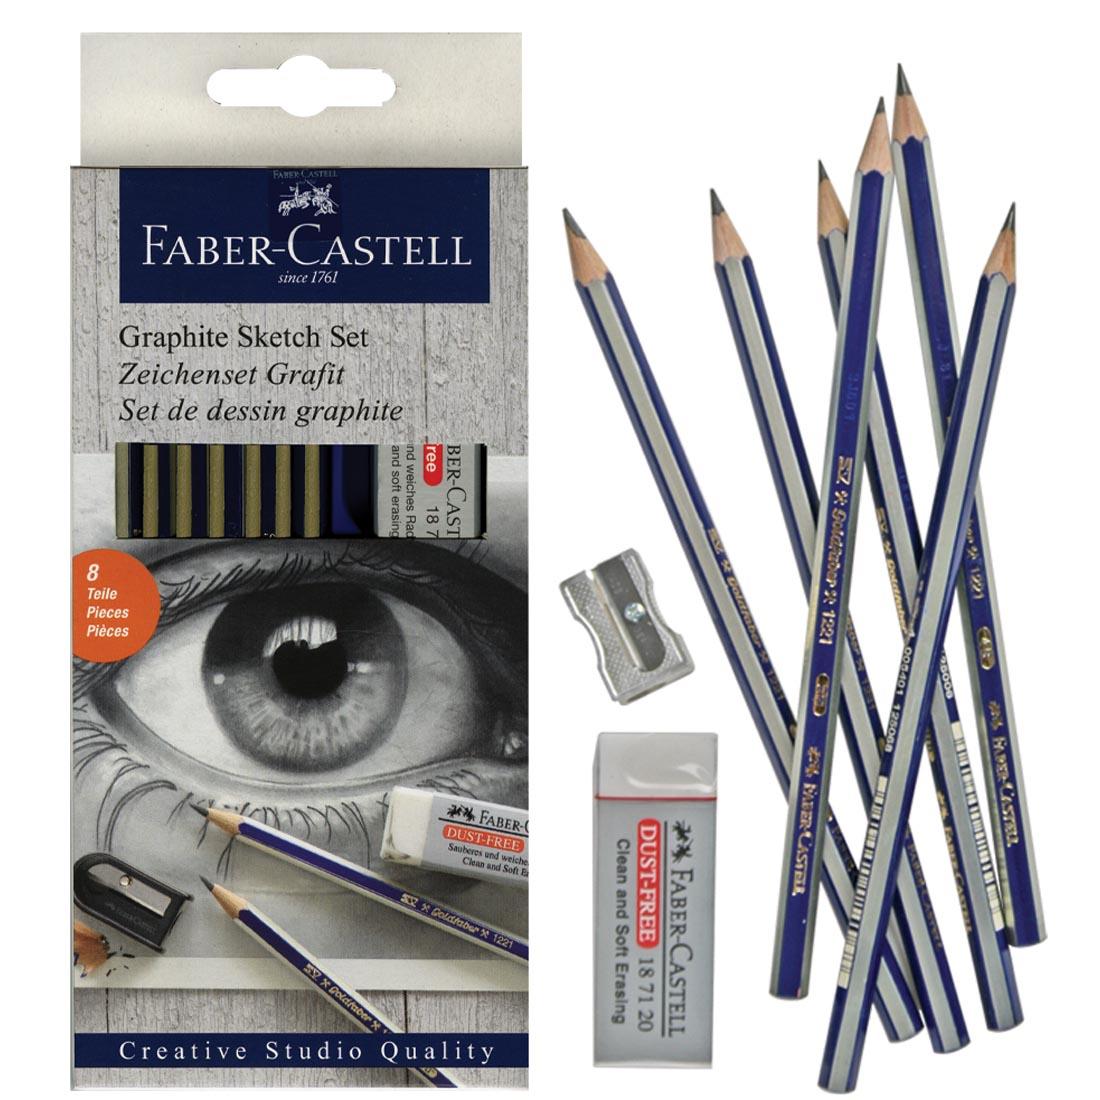 4B 2H Faber-Castell Graphite 6 Pencil Set-2B 6B HB B with Eraser